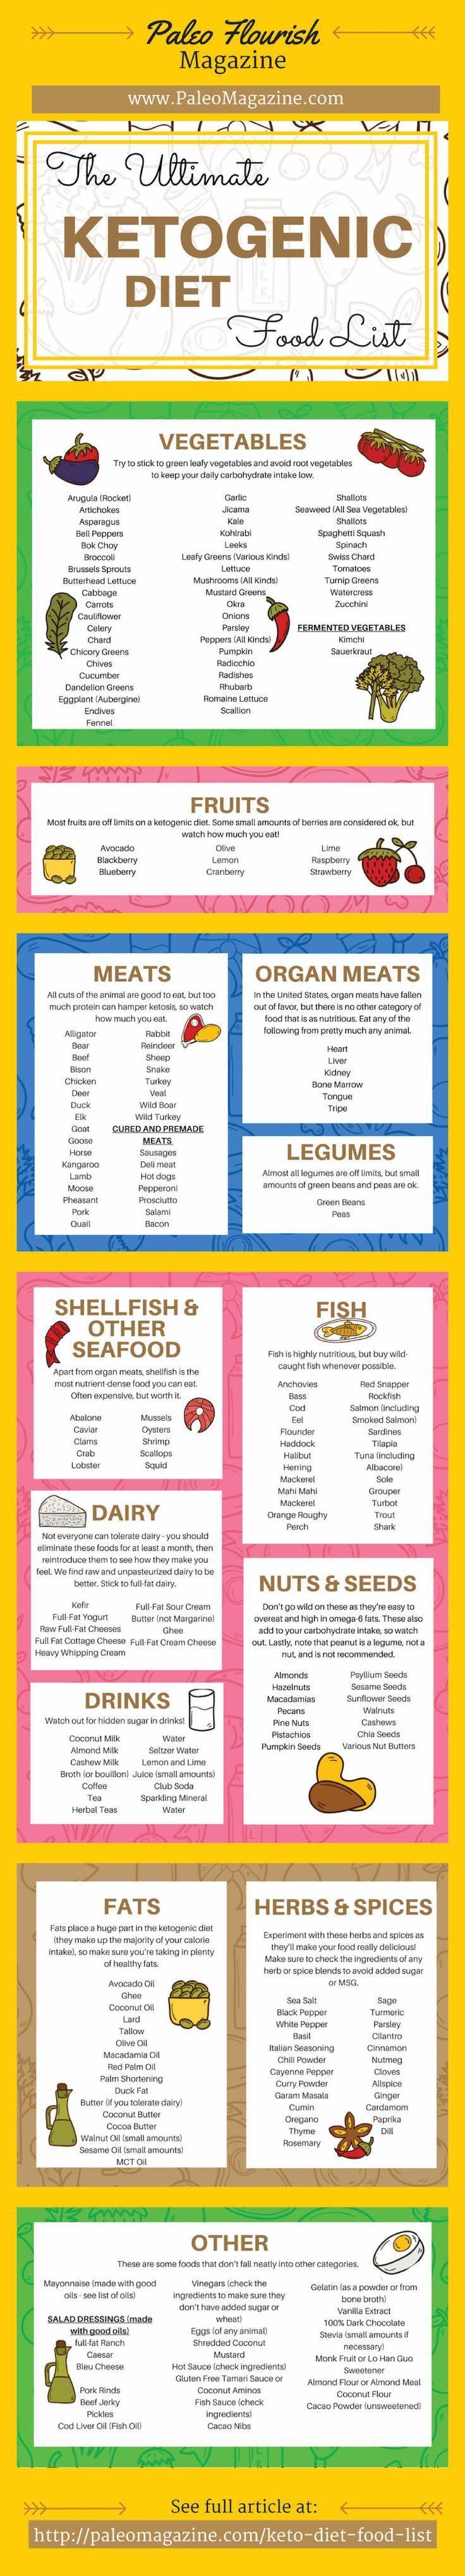 Ketogenic Diet Food List Infographic - https://paleomagazine.com/ketogenic-diet-food-list #ketogenic #keto